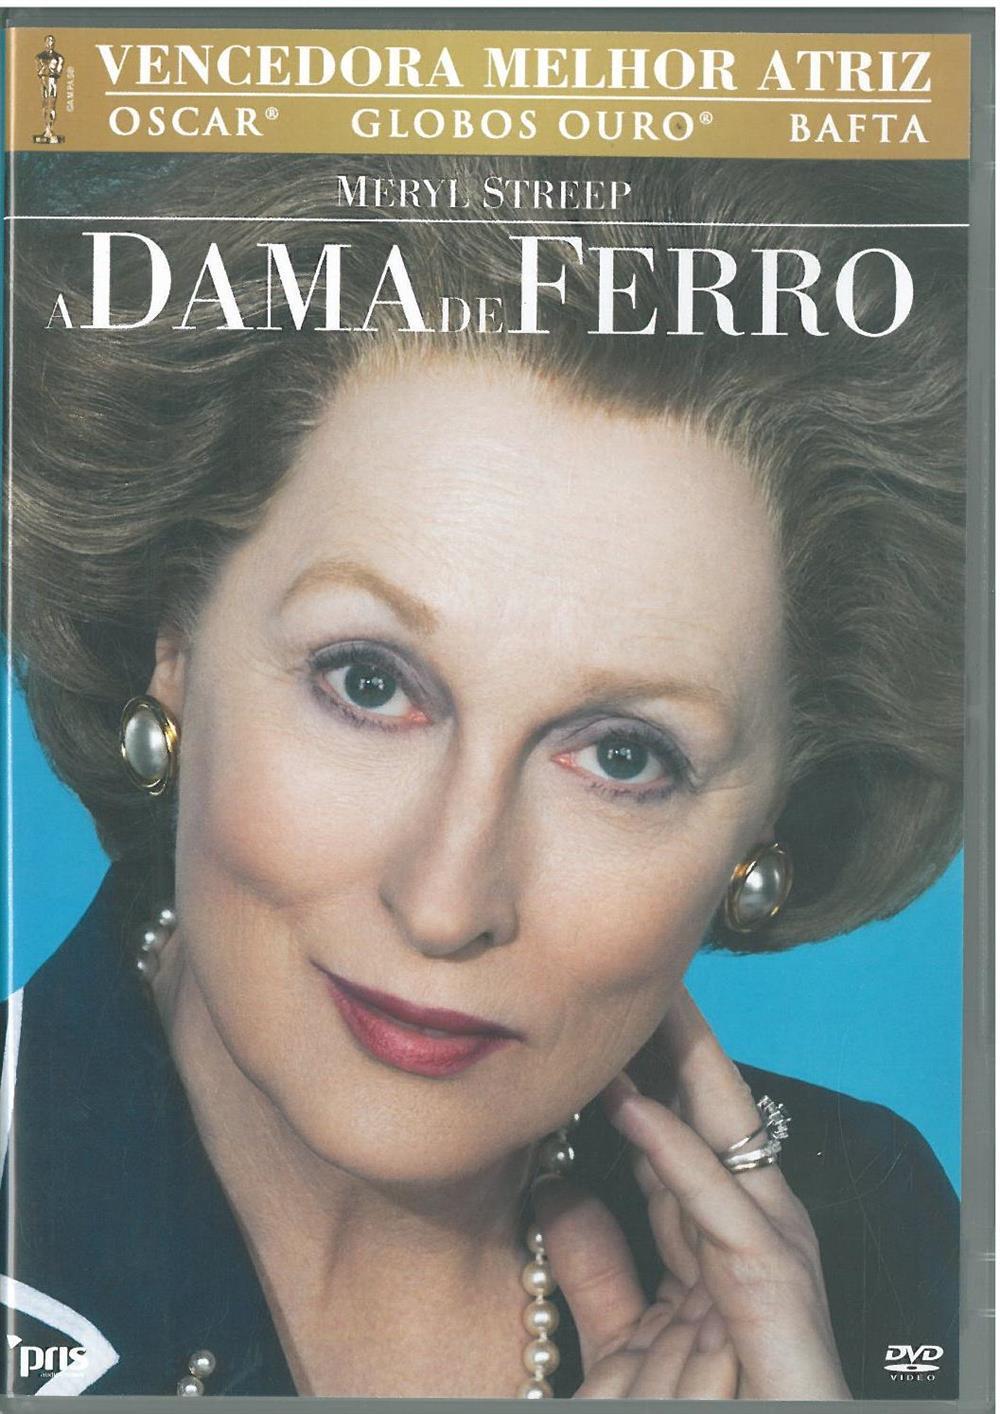 A dama de ferro_DVD.jpg